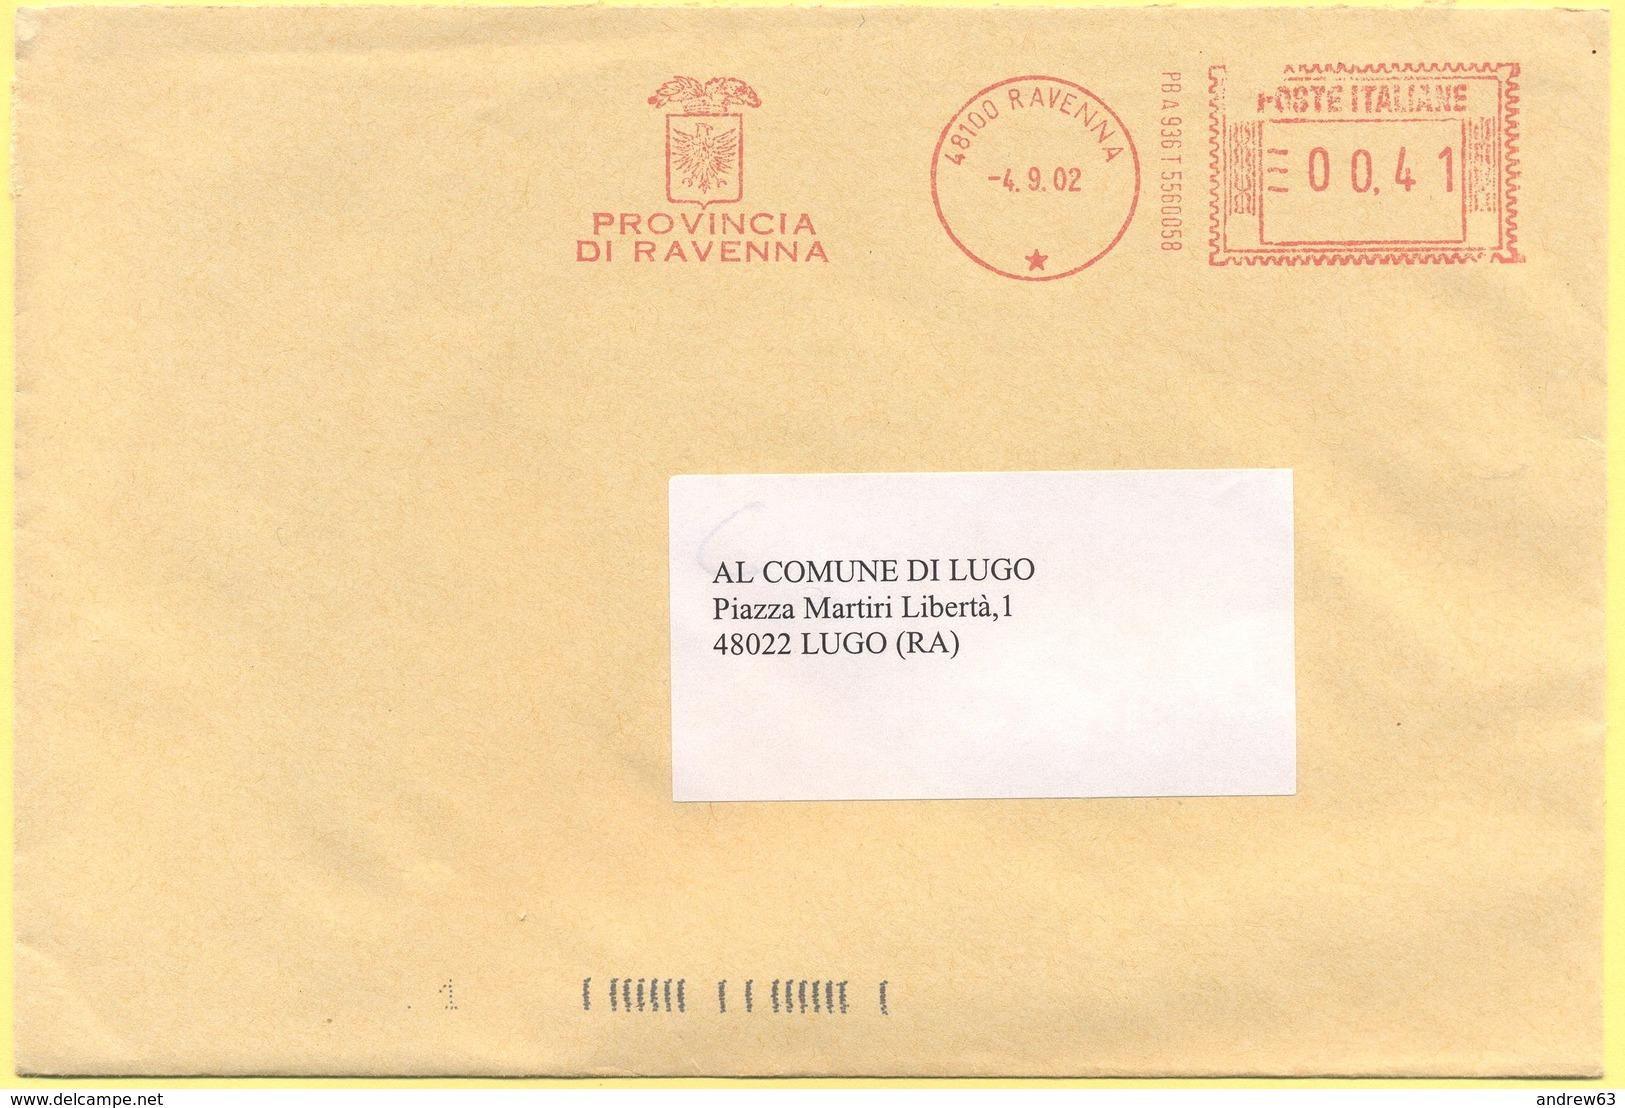 ITALIA - ITALY - ITALIE - 2002 - 00,41€ EMA, Red Cancel - Provincia Di Ravenna - Viaggiata Da Ravenna Per Lugo - Affrancature Meccaniche Rosse (EMA)